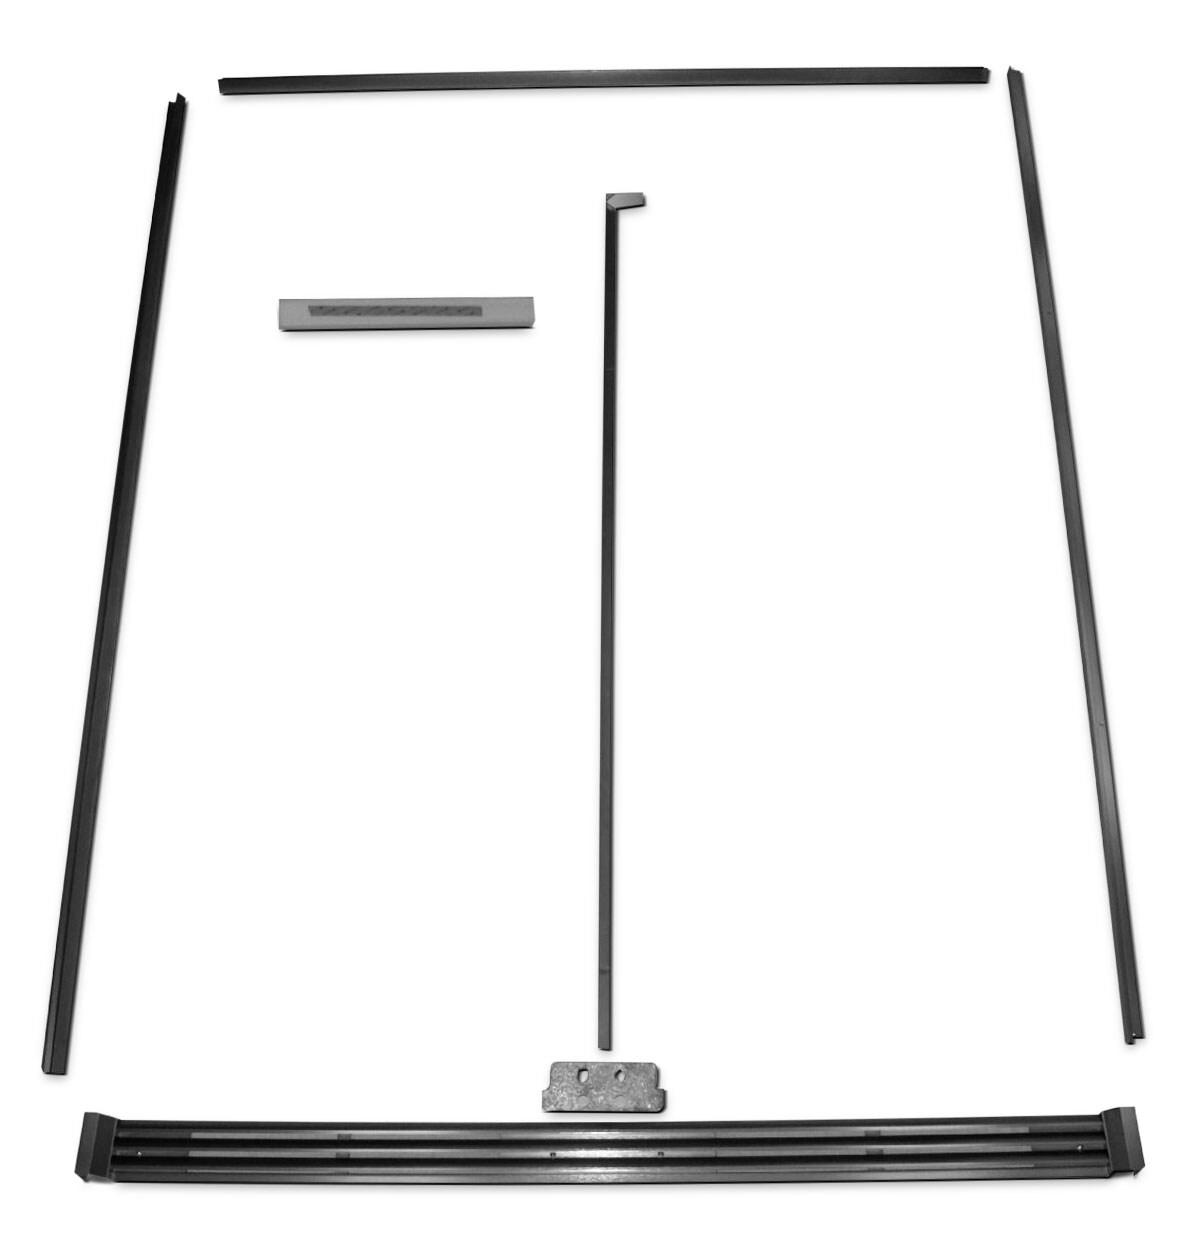 Whirlpool SideKick® Upright Freezer/Refrigerator Trim Kit – SKT60M